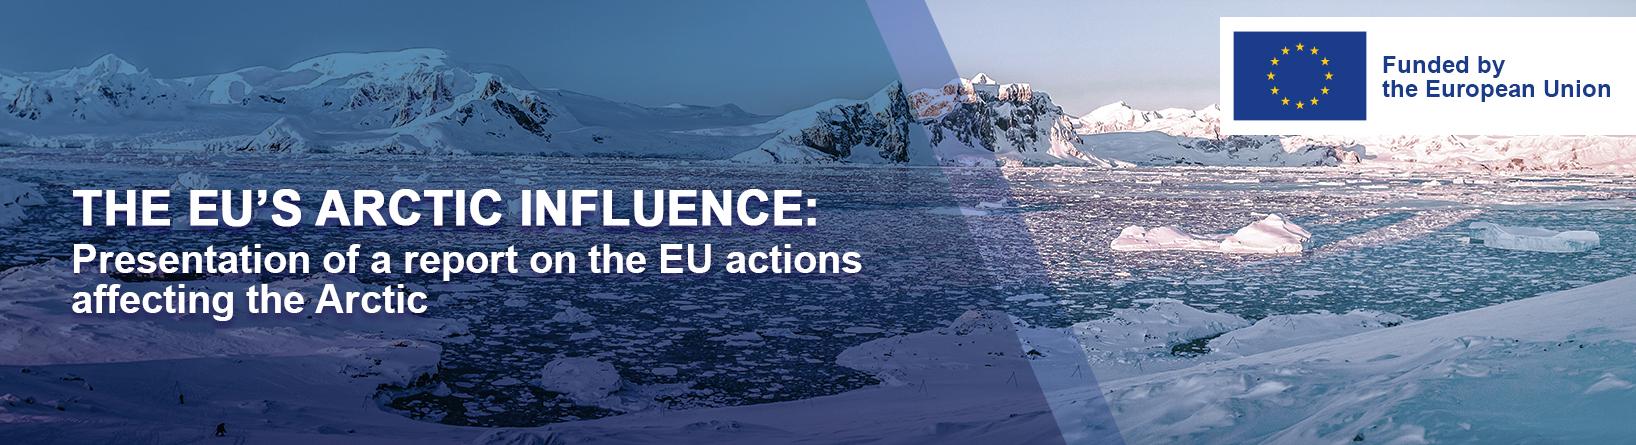 Arctic Influence